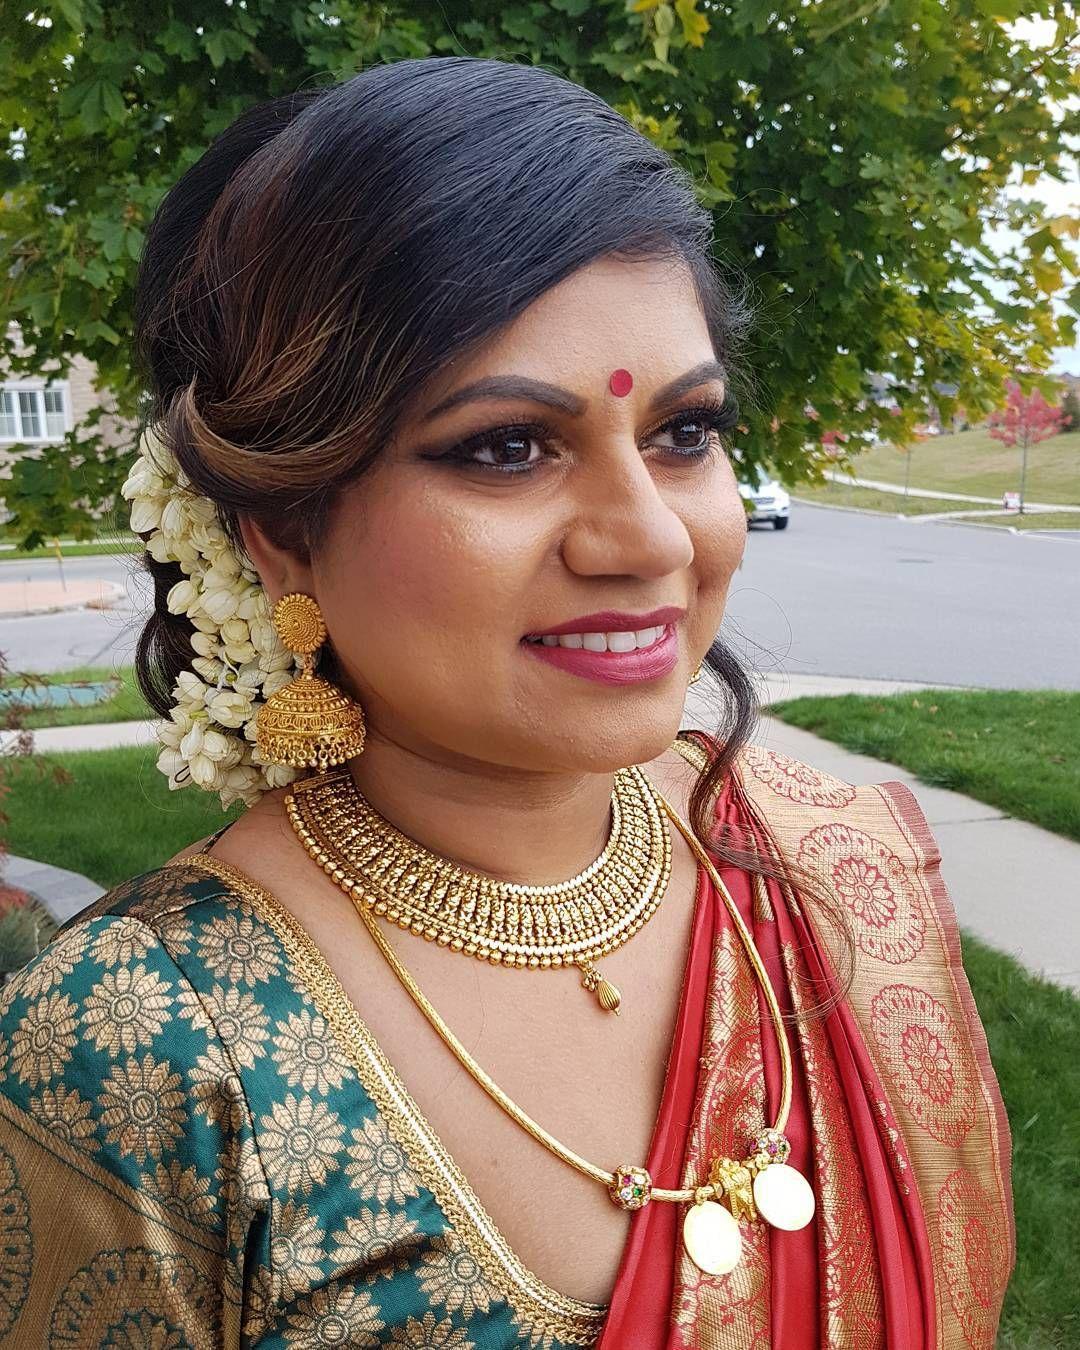 Wedding Hairstyle Tamilnadu: #torontostyle #indianfashion #Muah #torontomakeupartist